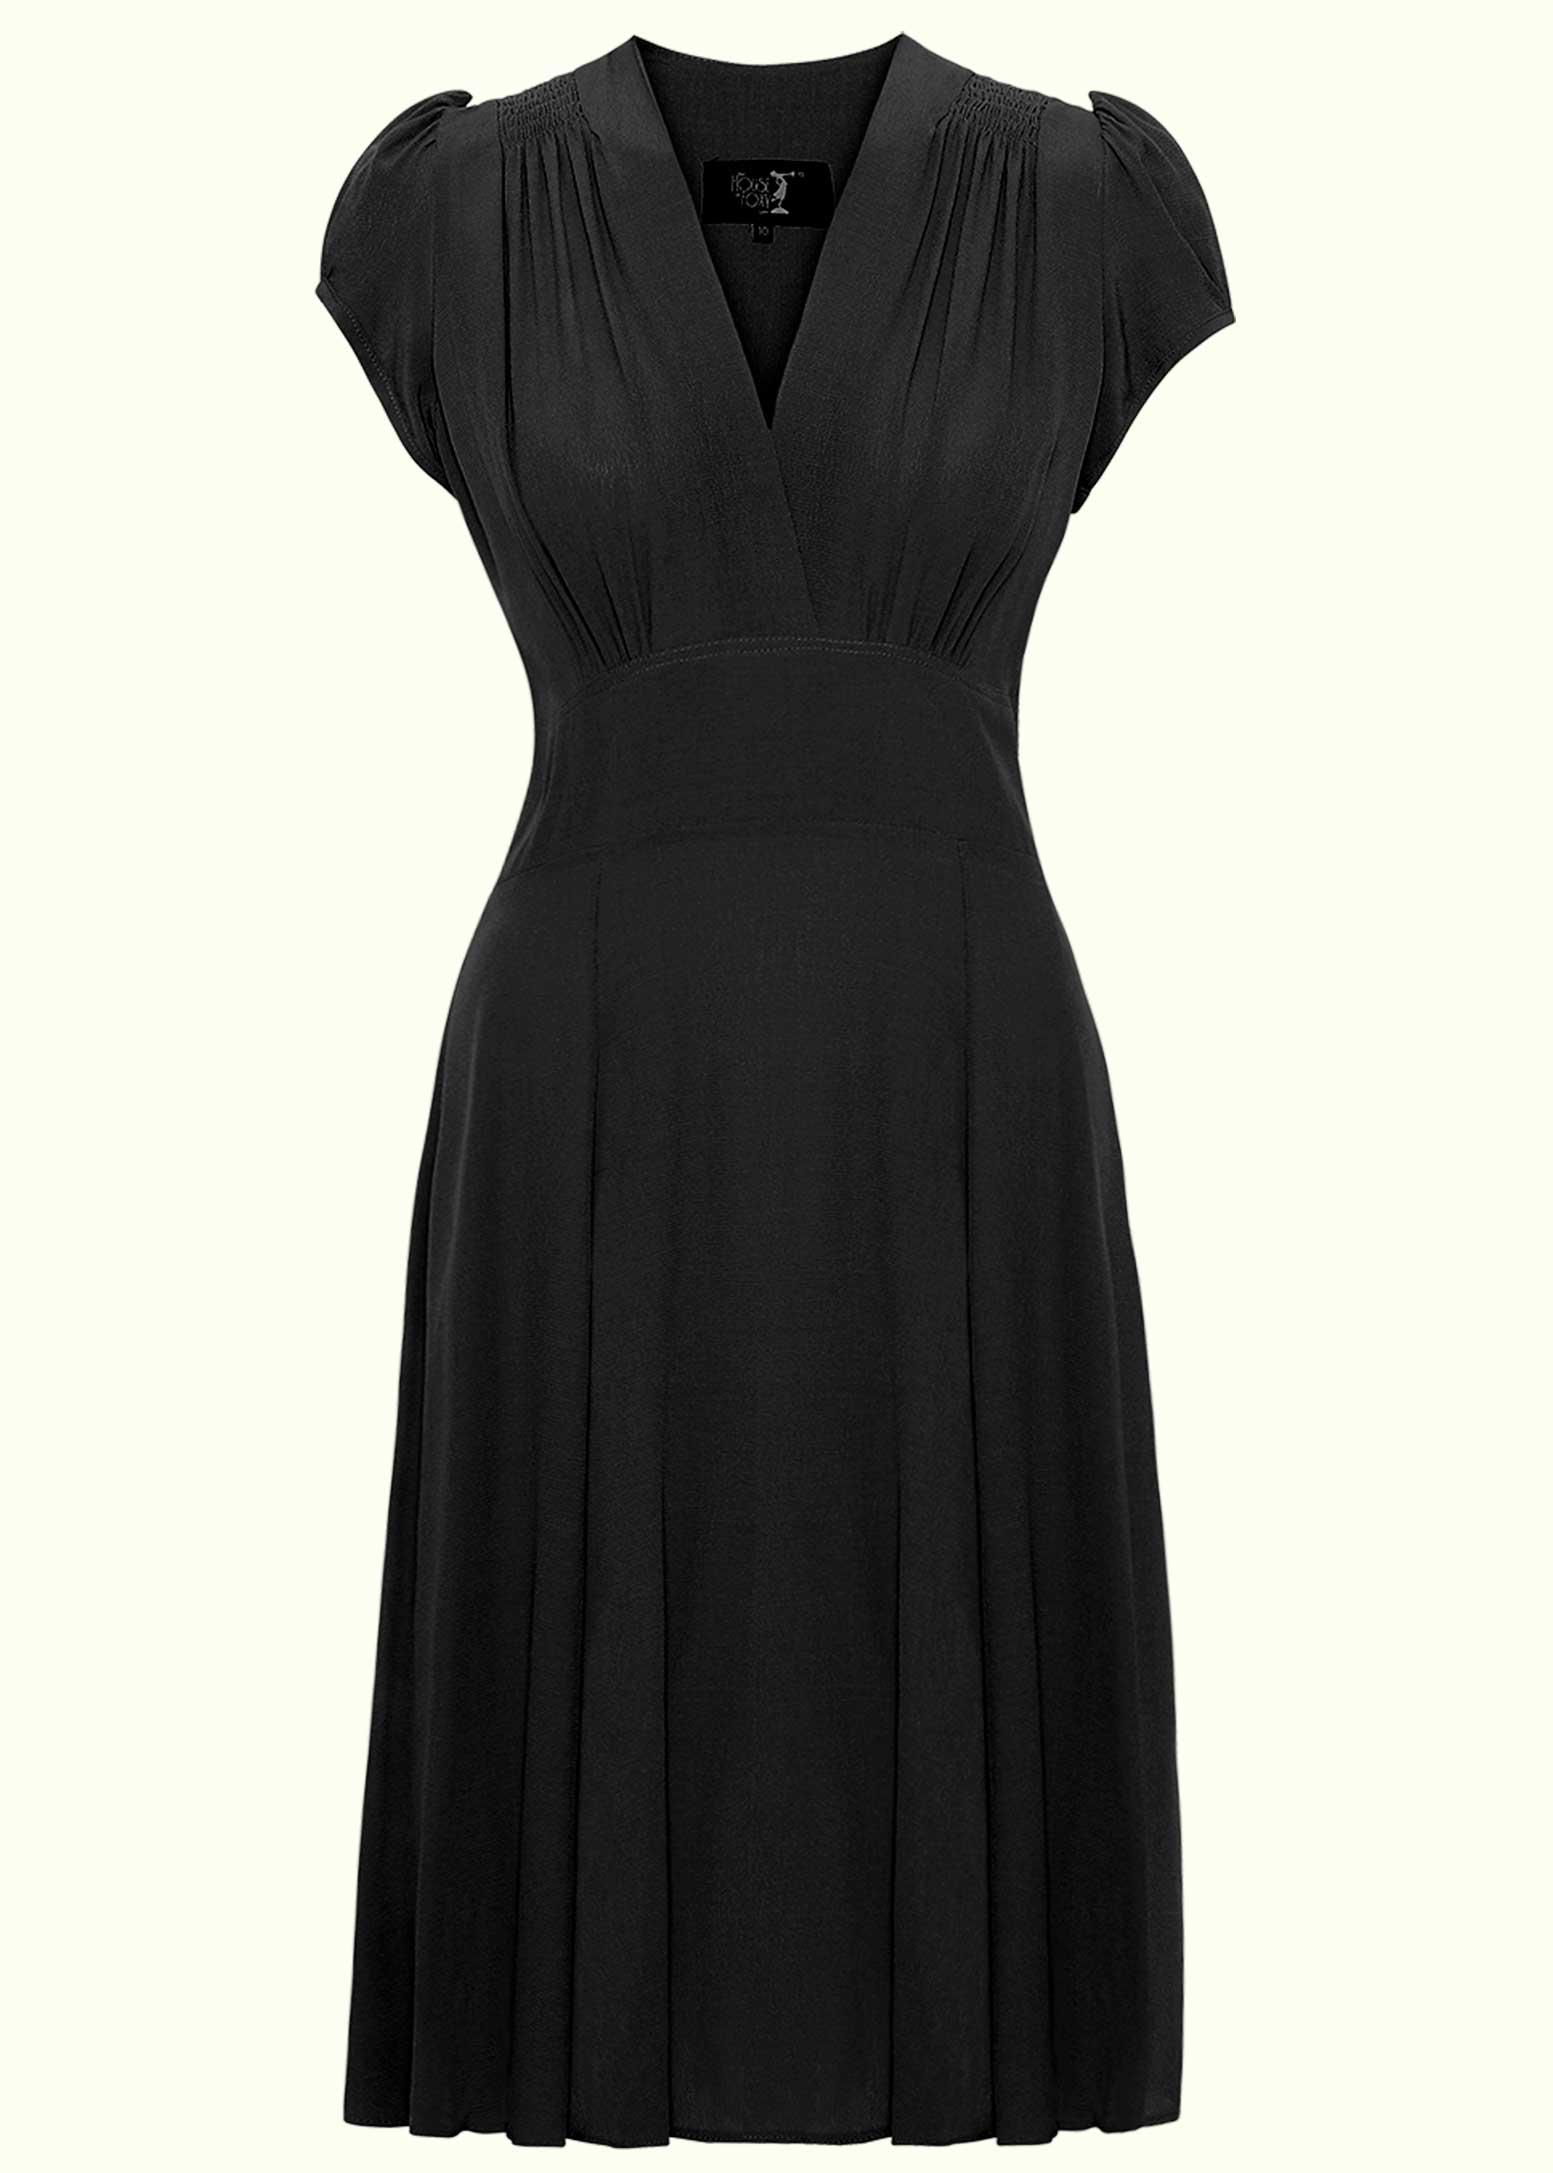 1930s style dress -the little black